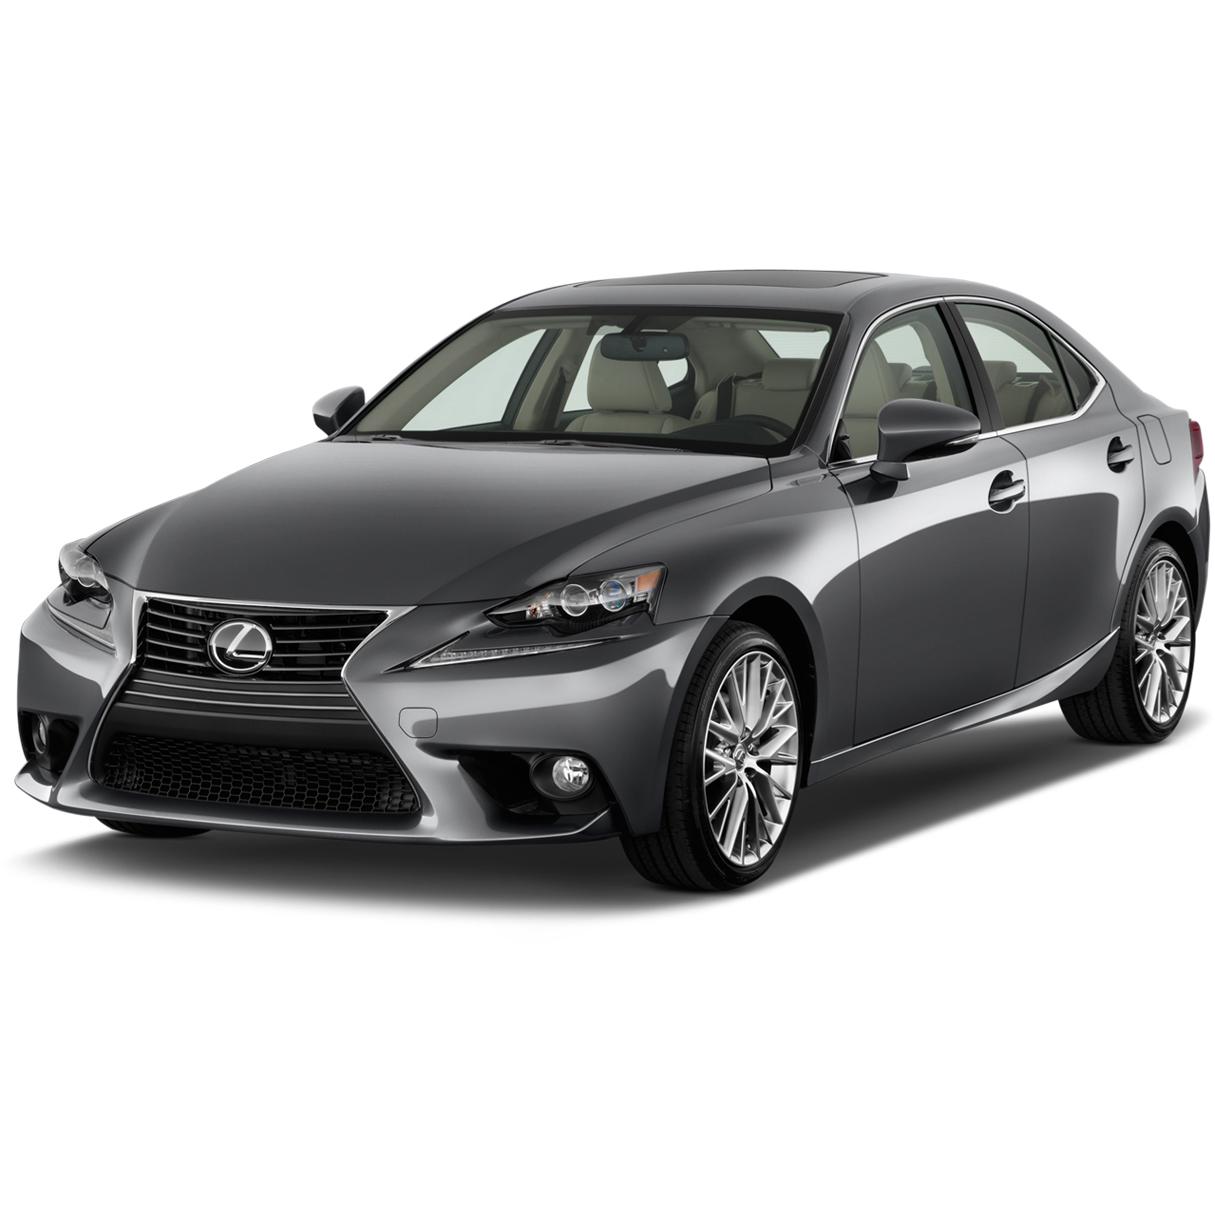 Lexus IS 2013 Onwards